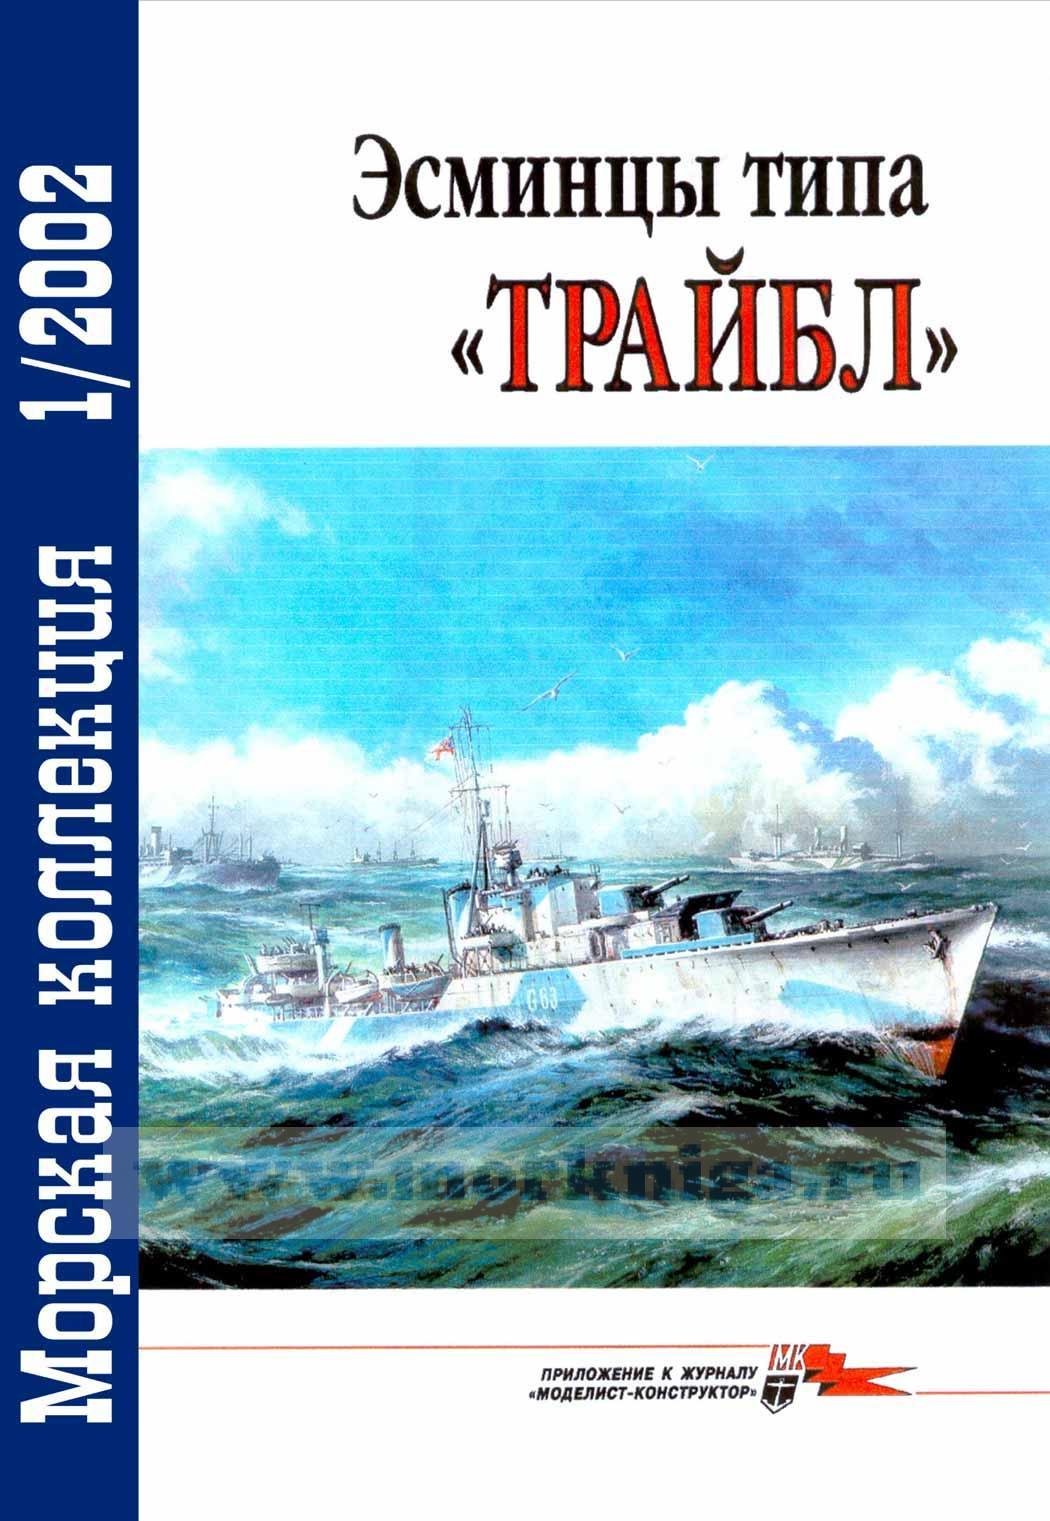 Эсминцы типа «ТРАЙБЛ». Морская коллекция №1 (2002)